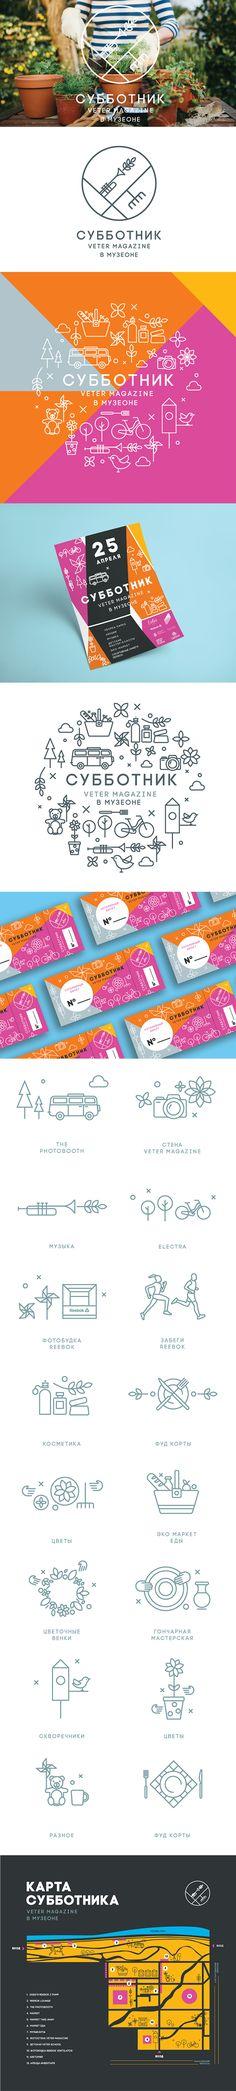 veter magazine, muzeon, субботник, park, identity, logotype, branding, fest, festival